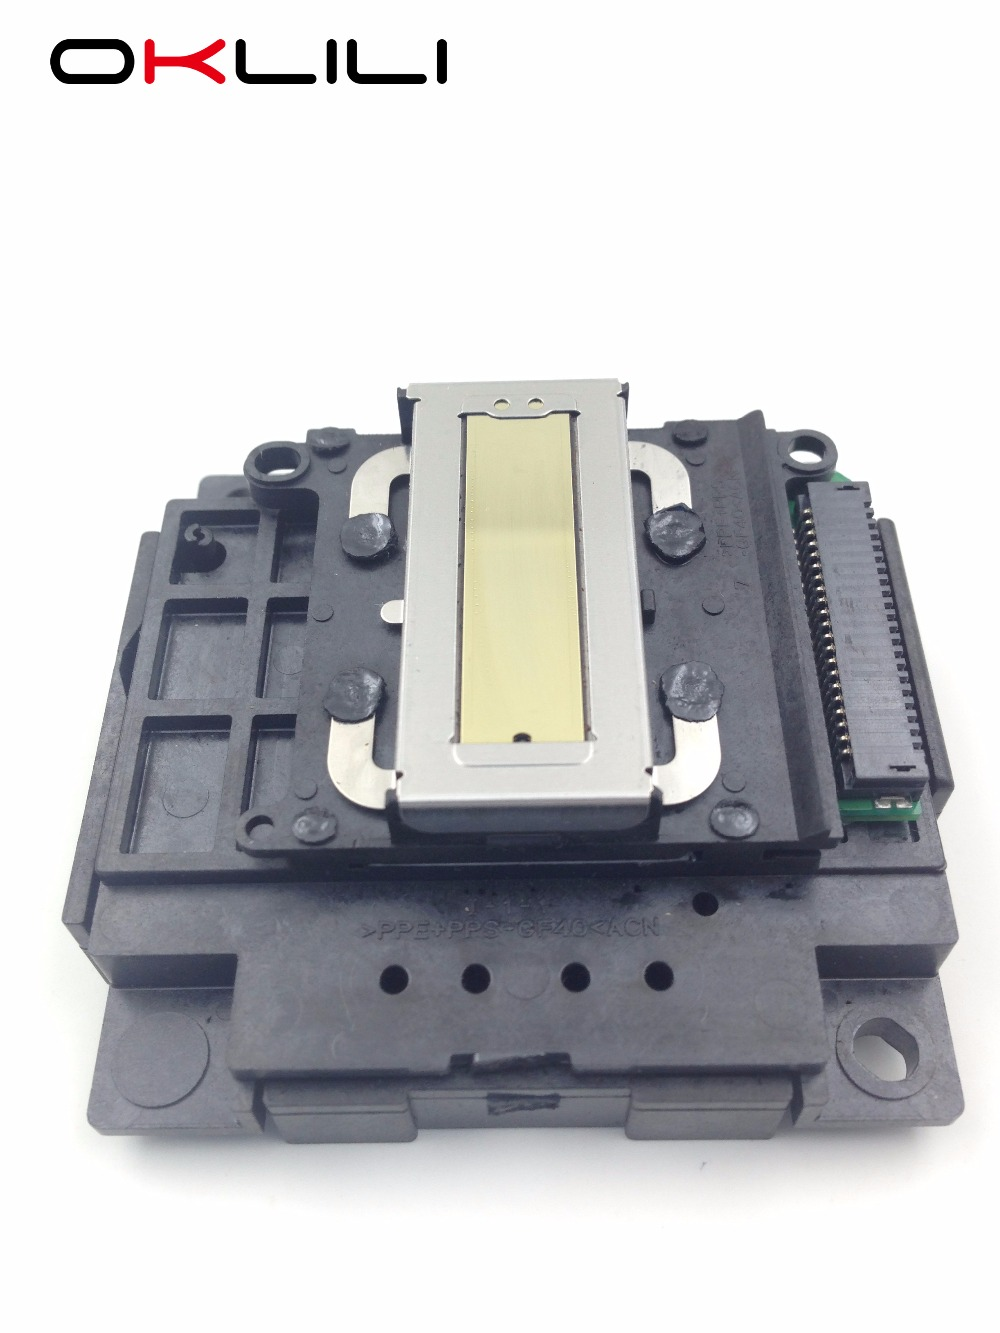 FA04000 FA04010 Κεφαλής εκτύπωσης Κεφαλή εκτύπωσης για εκτυπωτή Epson WF-2010 WF-2510 WF-2520 WF-2530 WF-2540 ME401 ME303 WF2010 WF2510